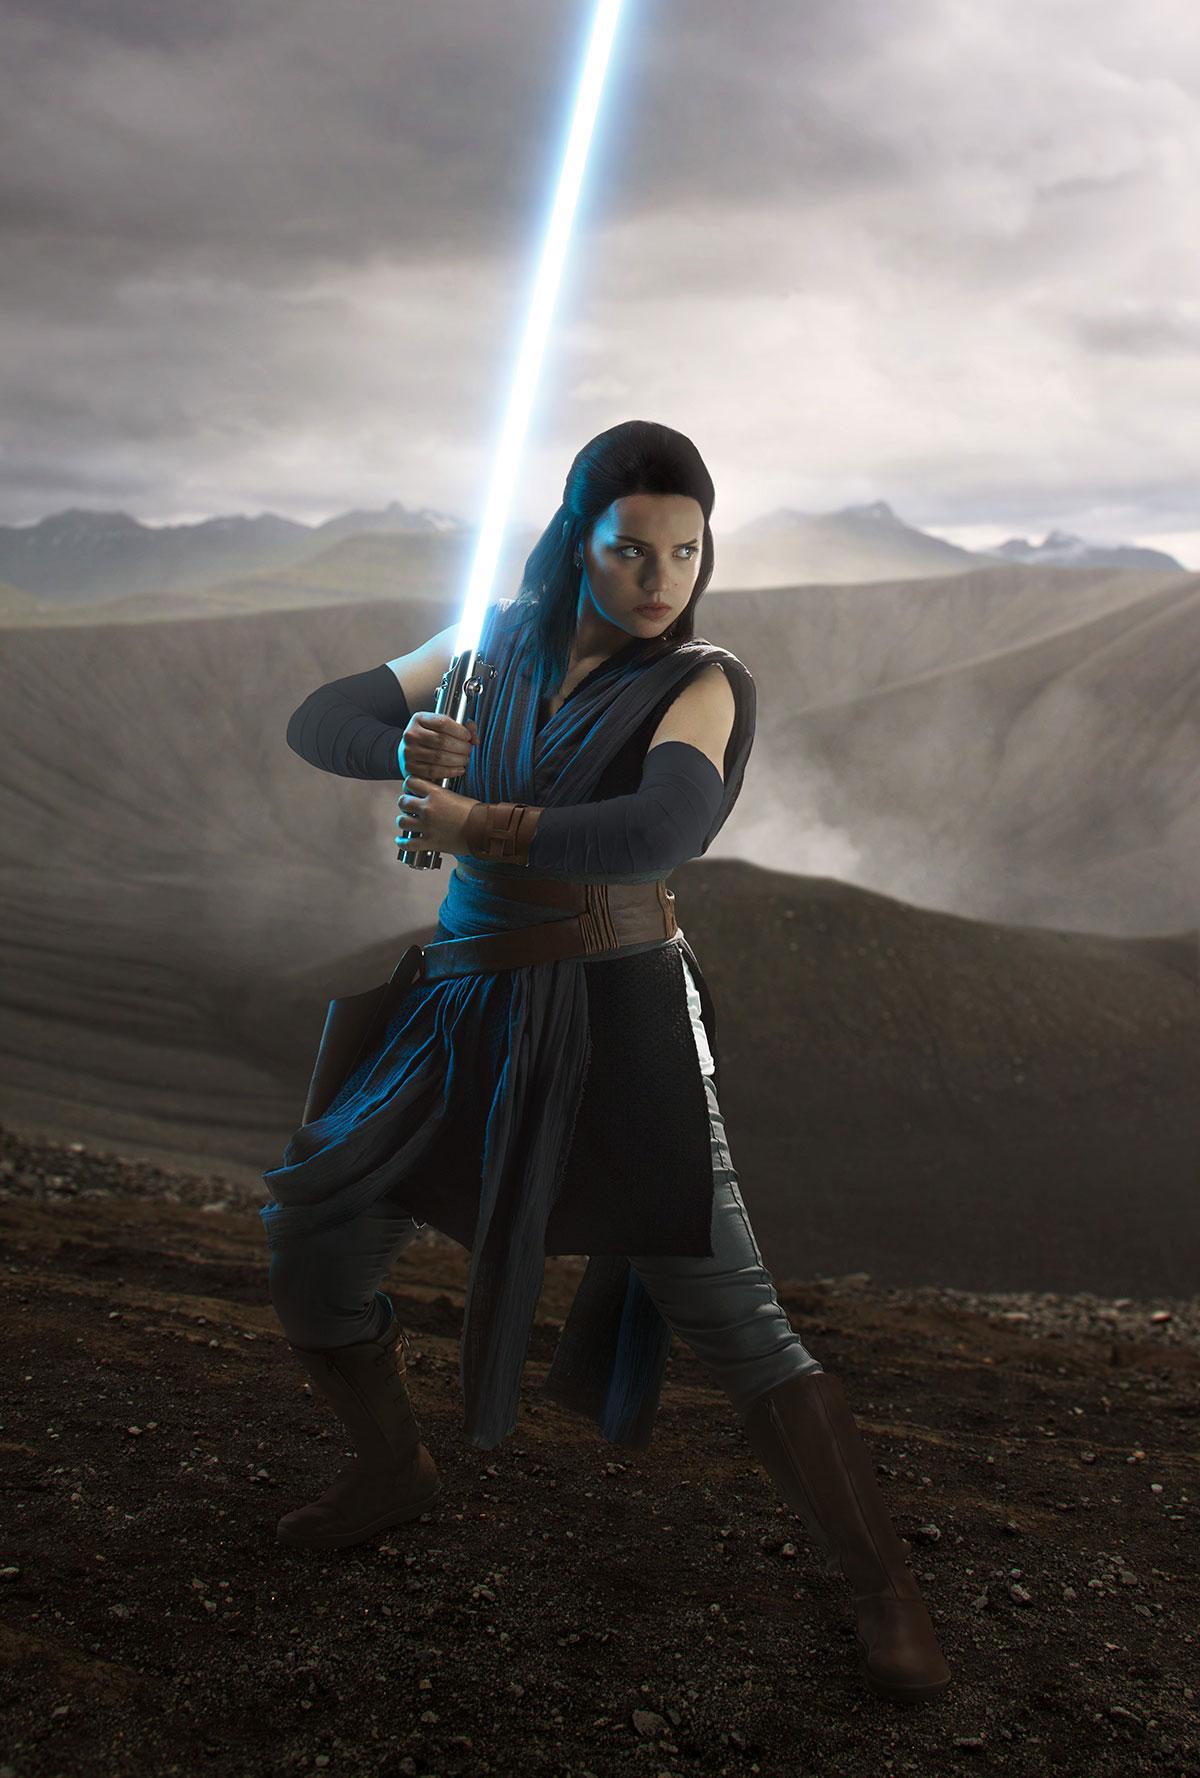 Arthur Sayanoff Rey Star Wars 11 08